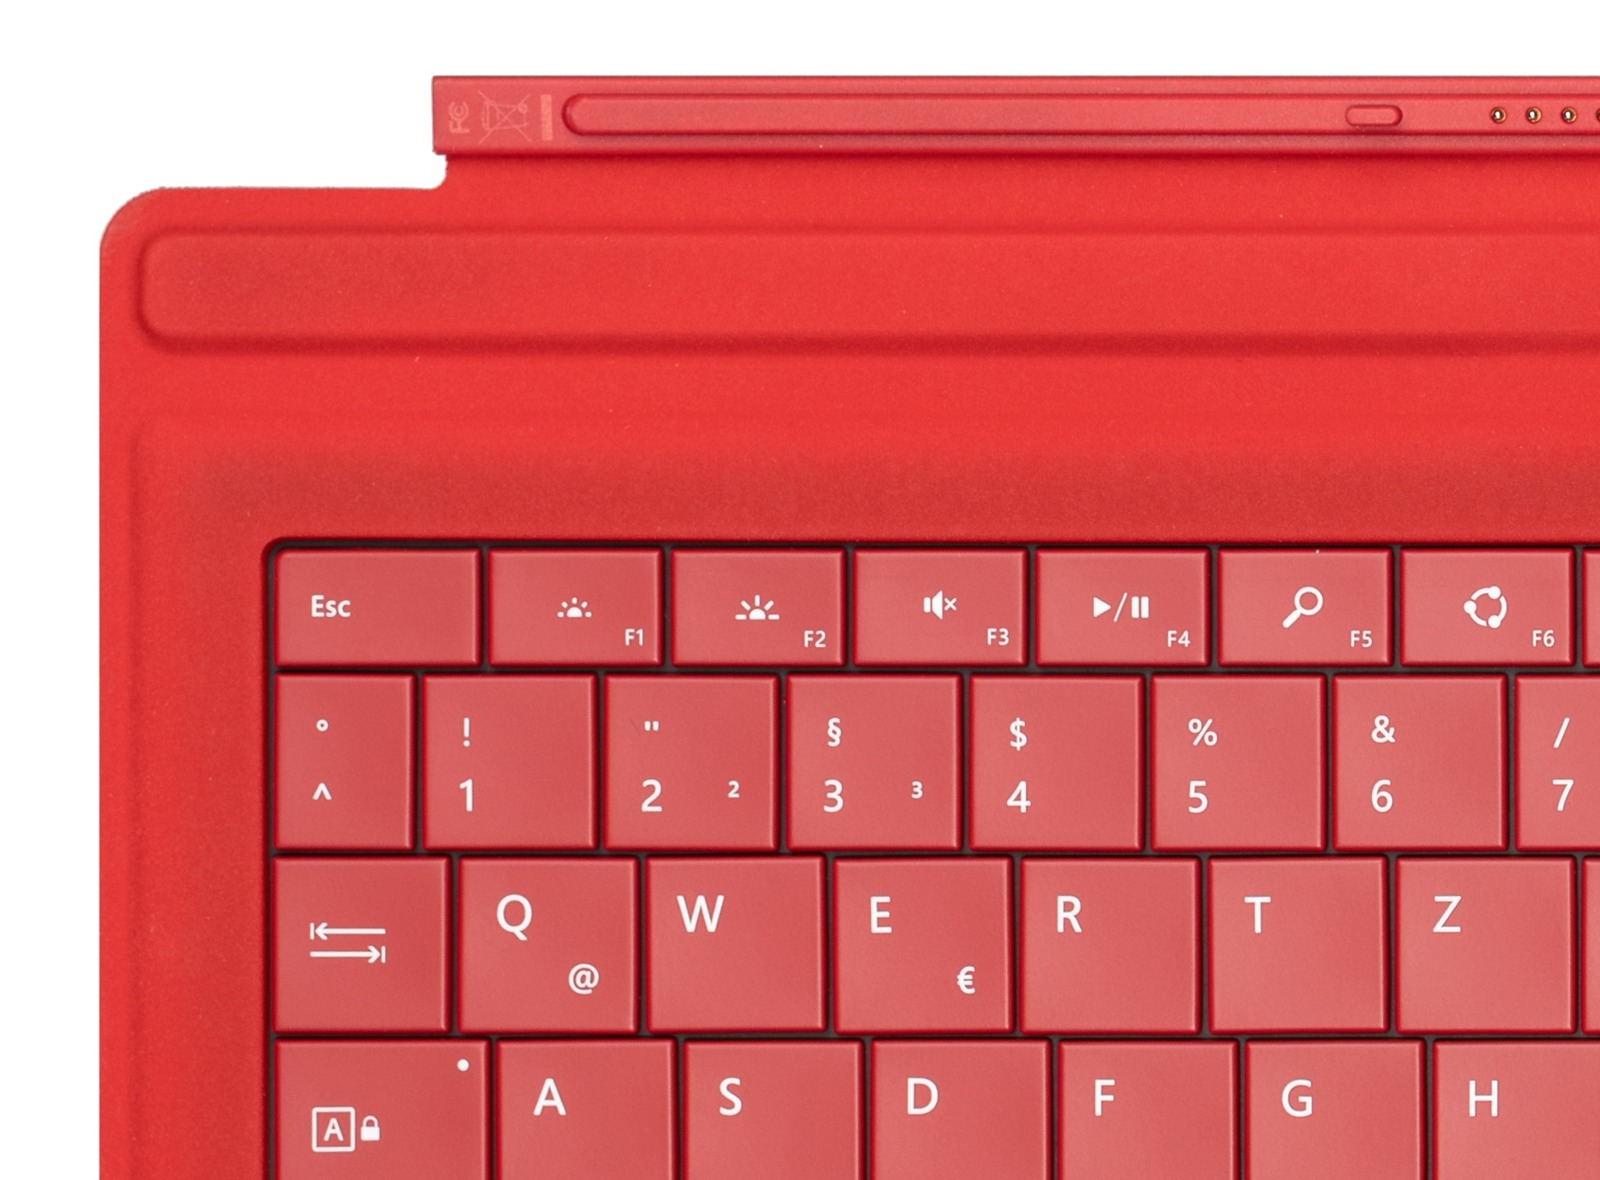 Keyboard Microsoft Surface Type Cover Pro 3 Red QWERTZ (German) Grade B